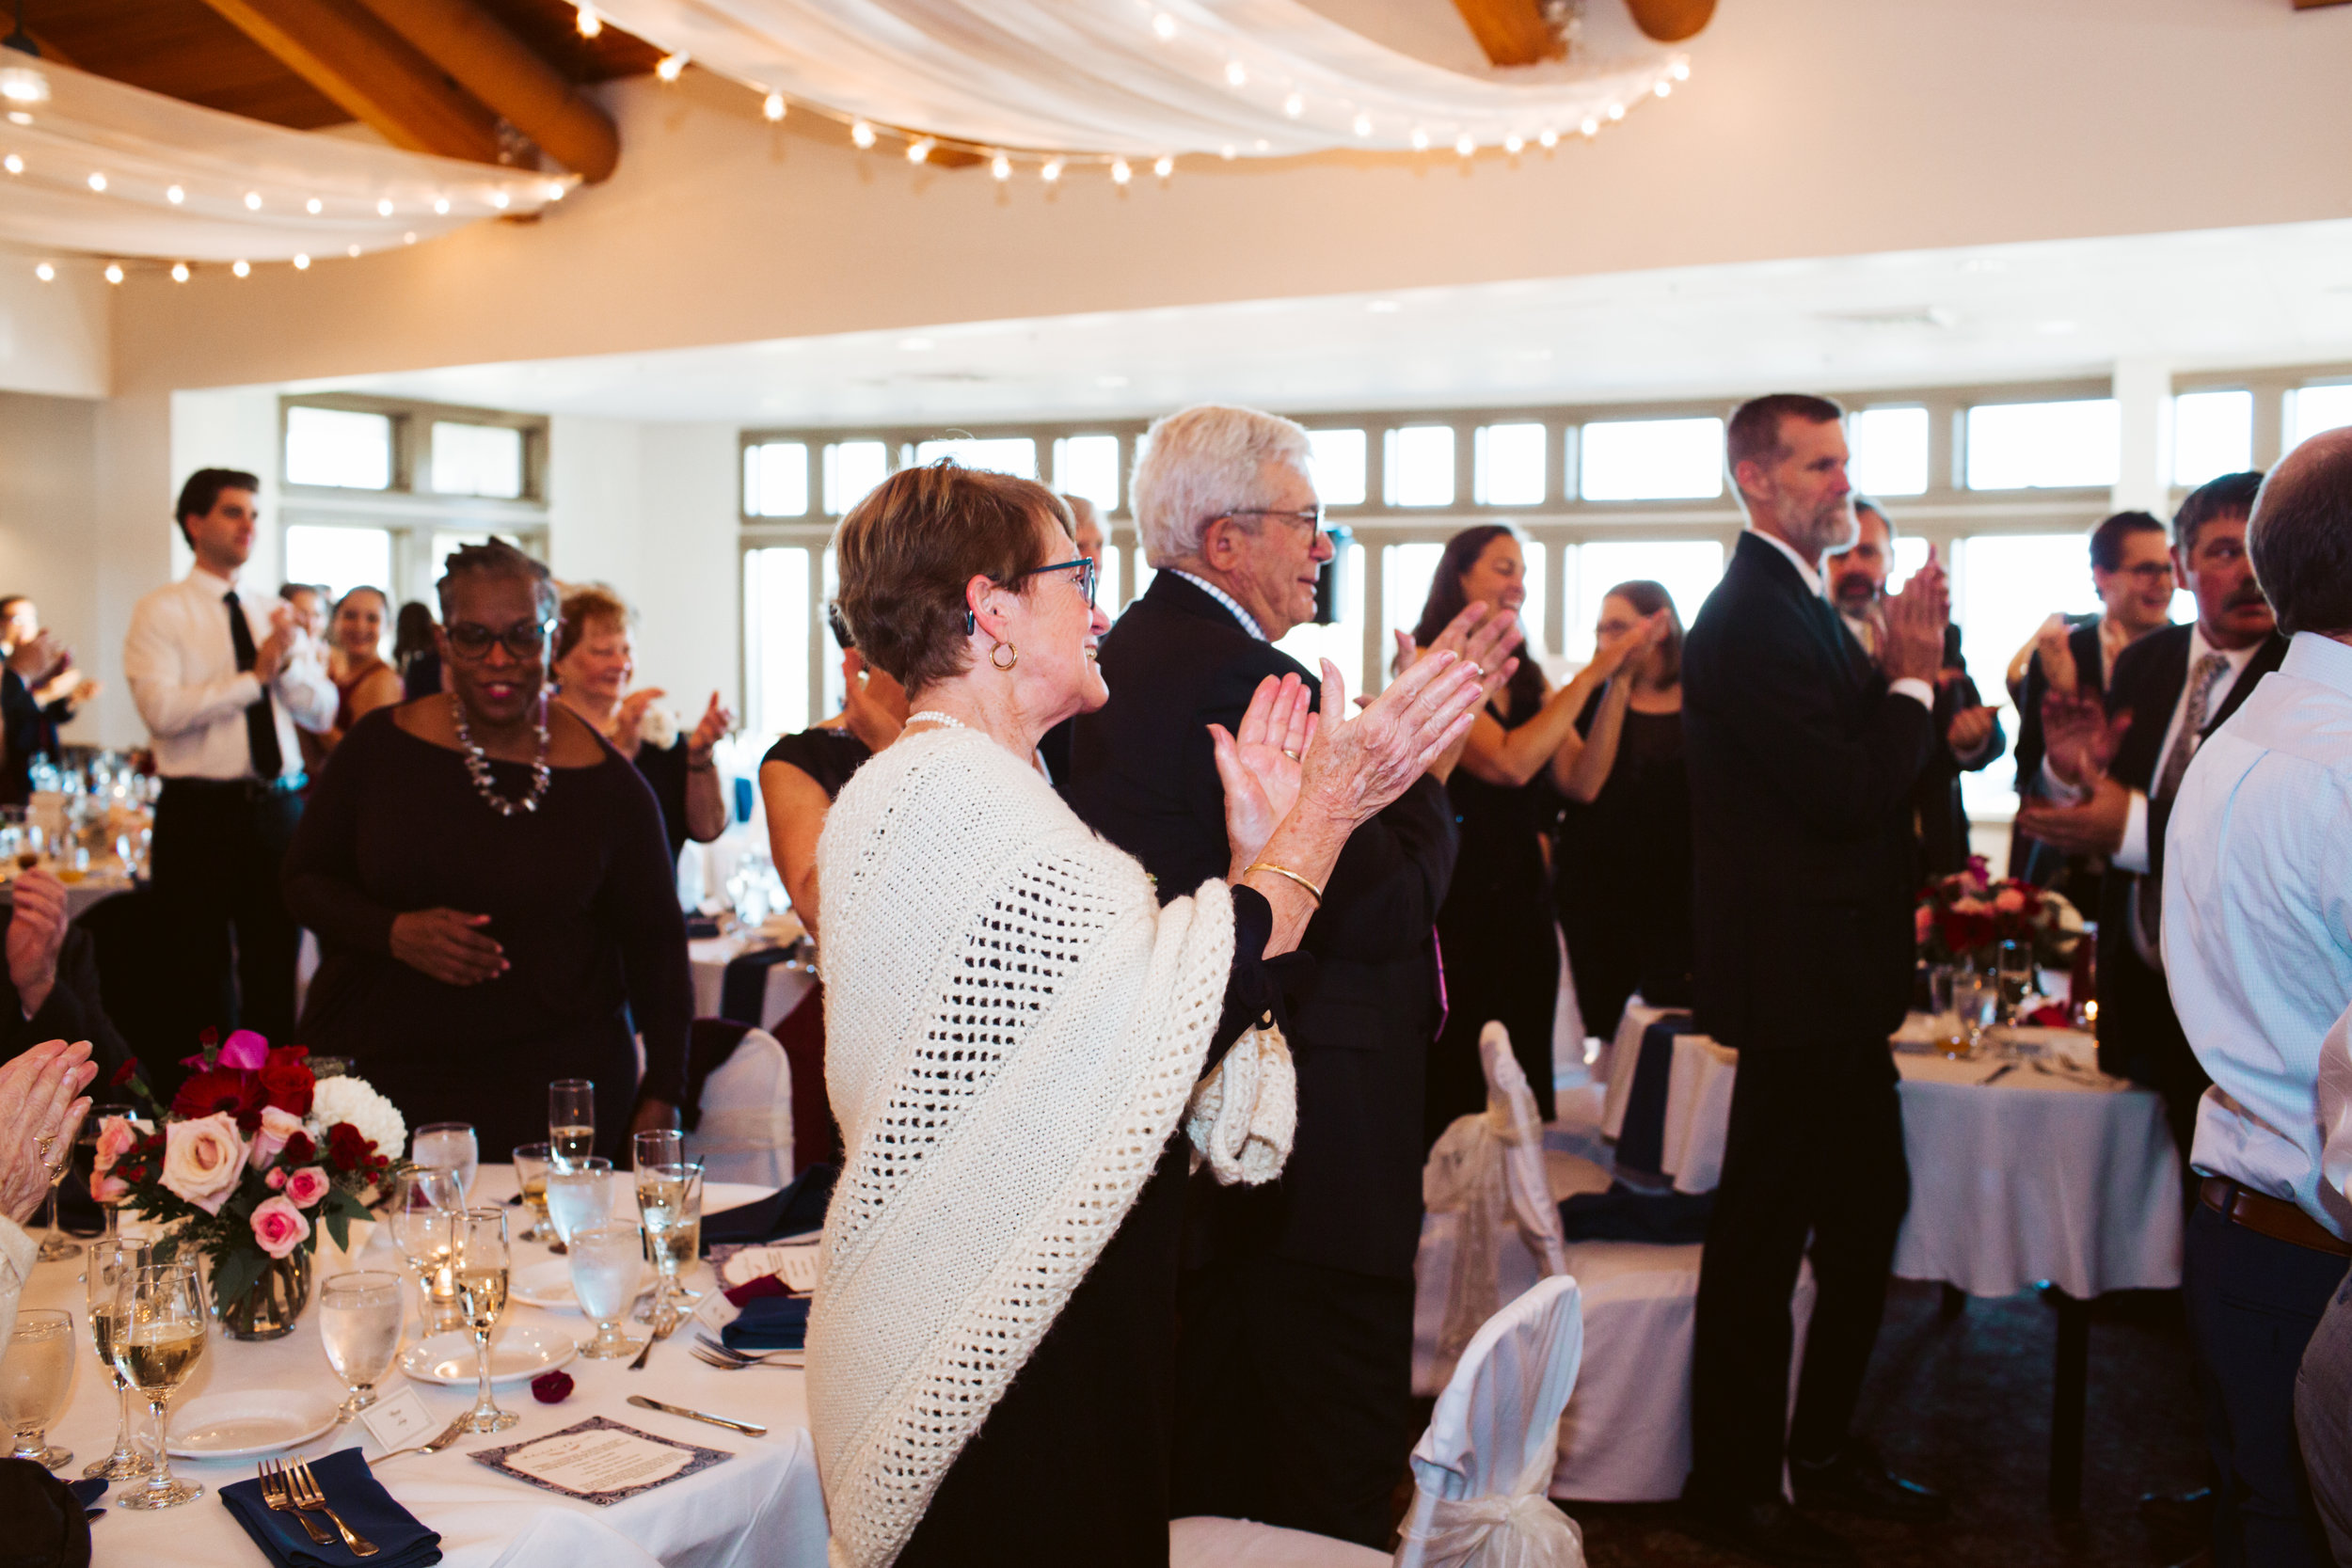 Jeff-and-Leslie-Wedding -8522.jpg